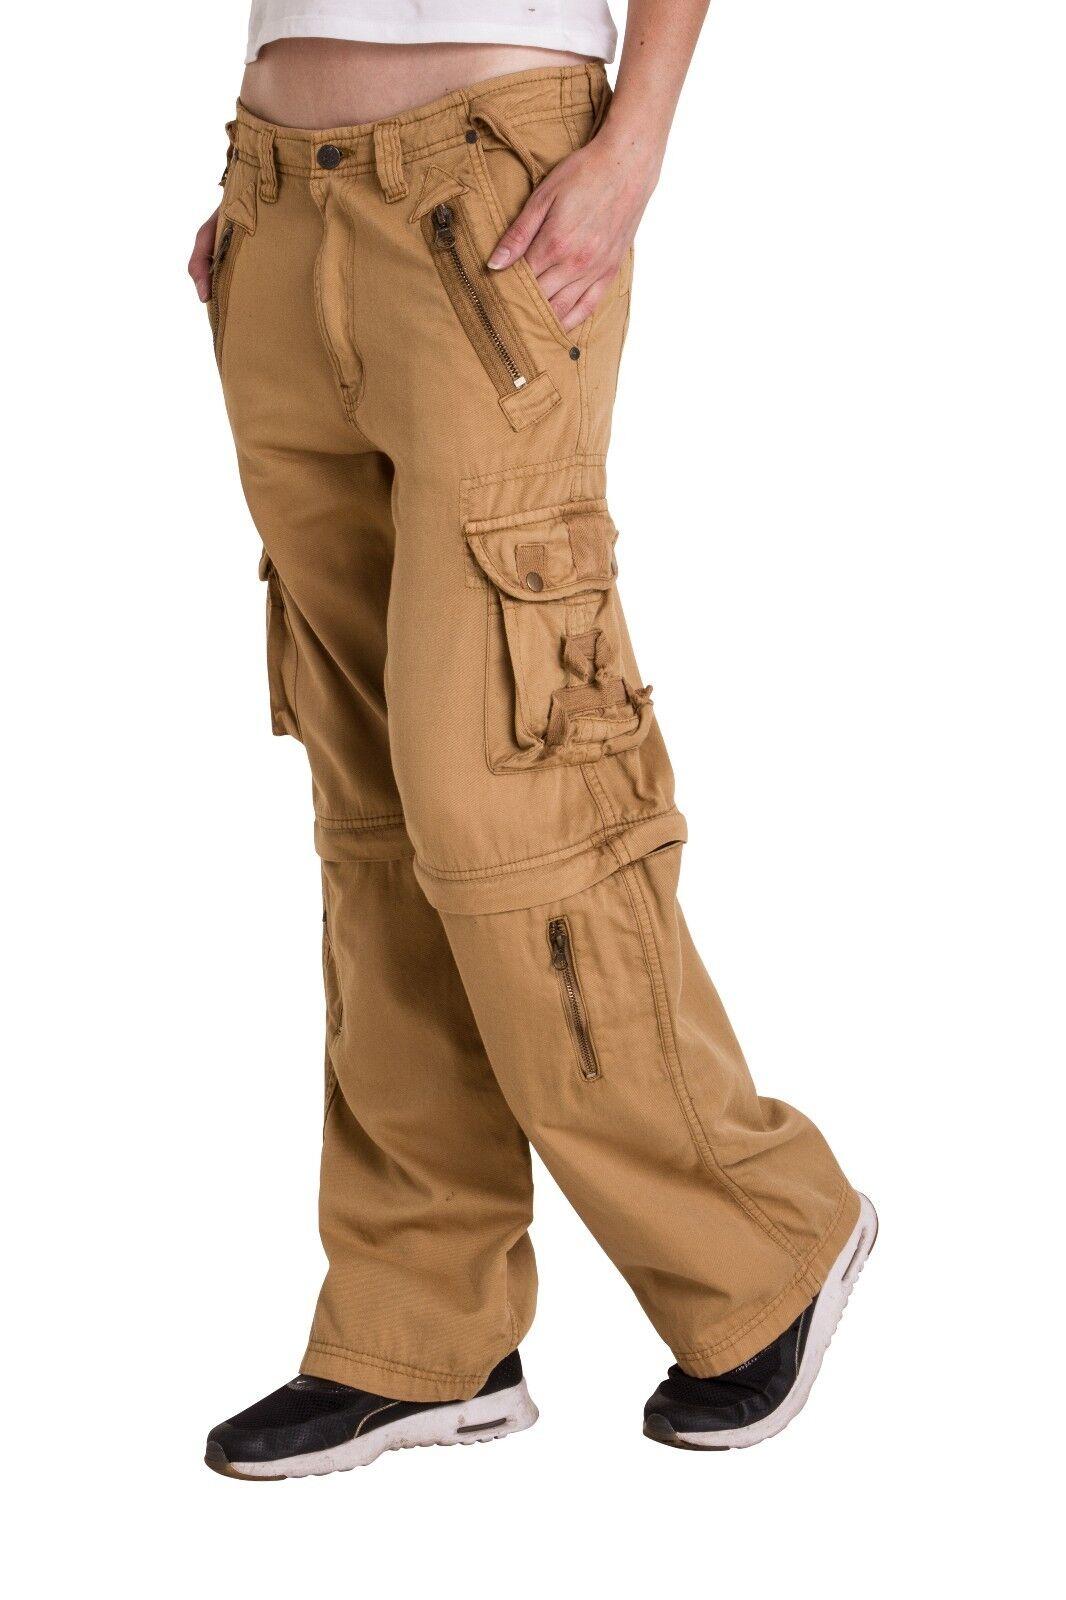 Pantalones Para Mujer Zip Off Convertible Varios Bolsillos Cargo Pantalones Senoras Ejercito Casual Control Ar Com Ar